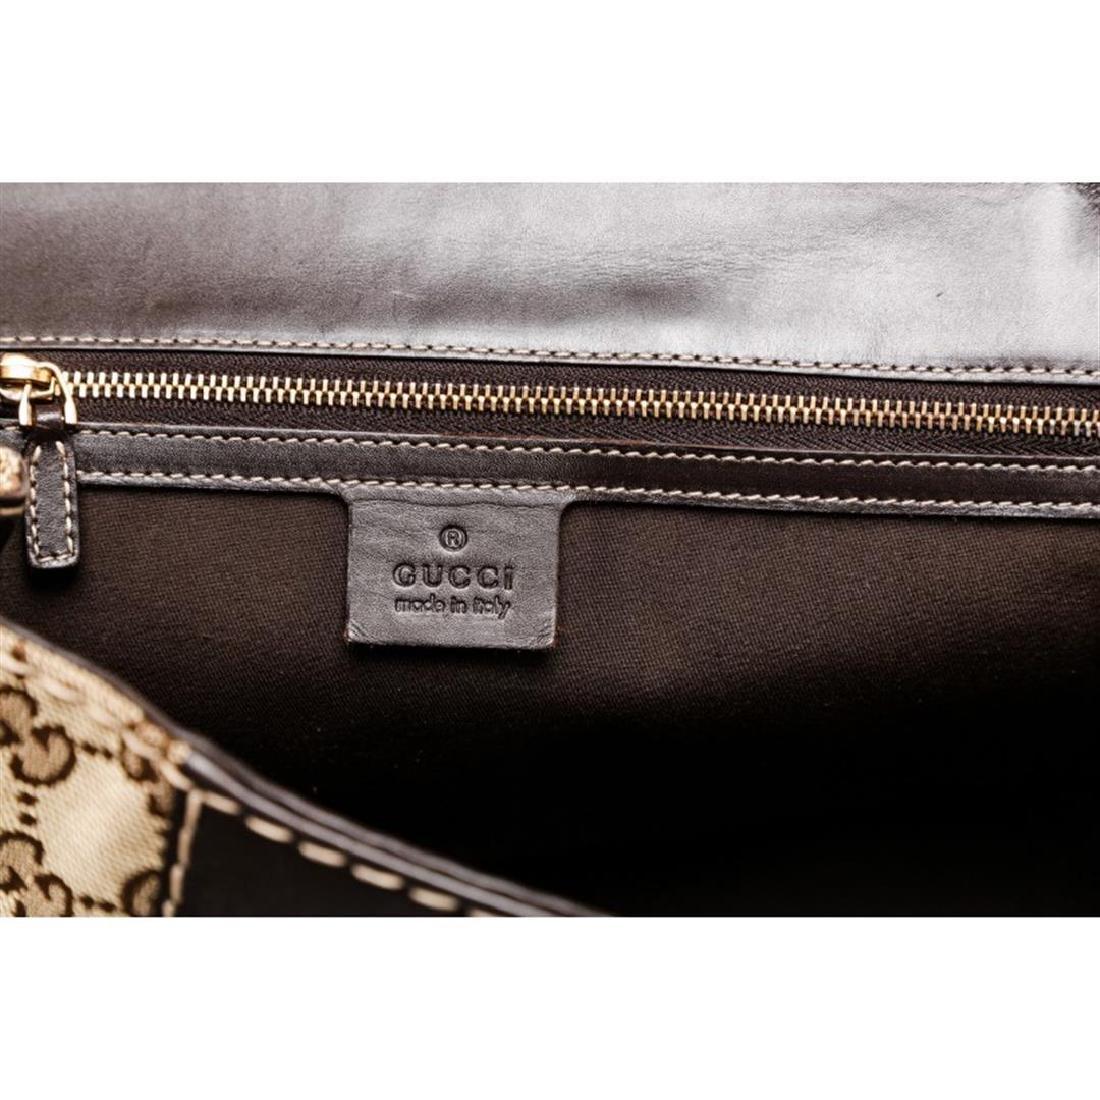 Gucci Beige Canvas Monogram Brown Leather Dialux Queen - 6